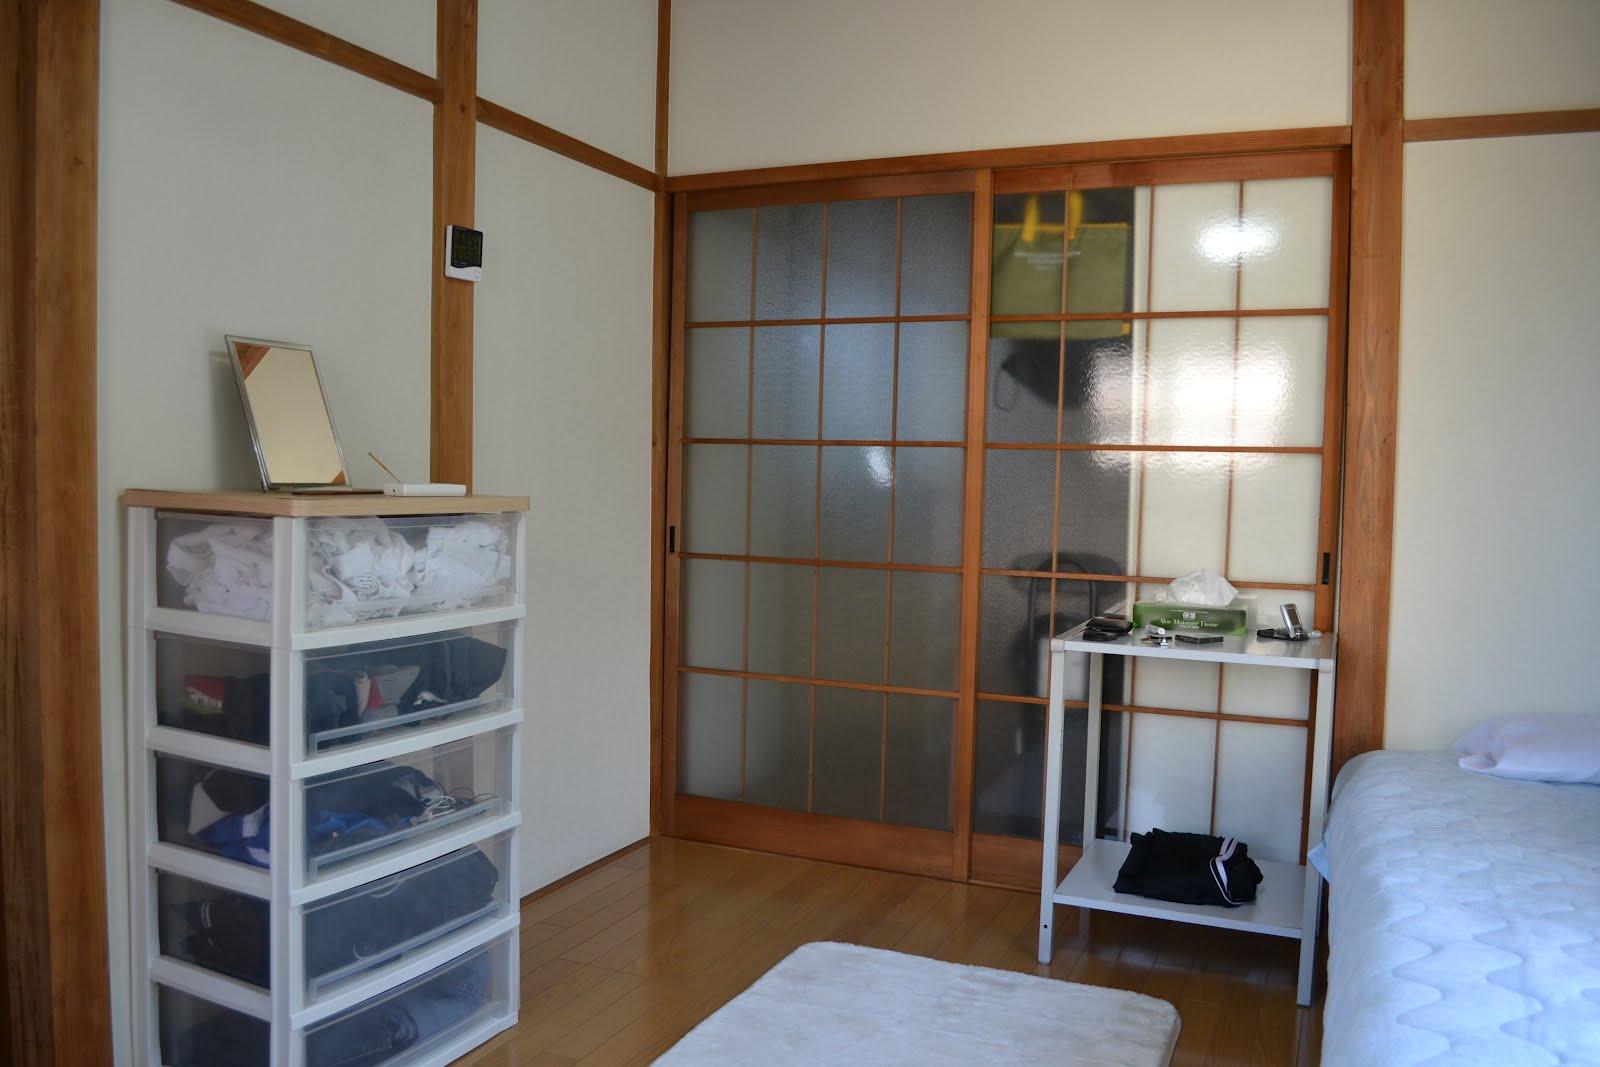 Home Priority Traditional Japanese Shoji Sliding Doors